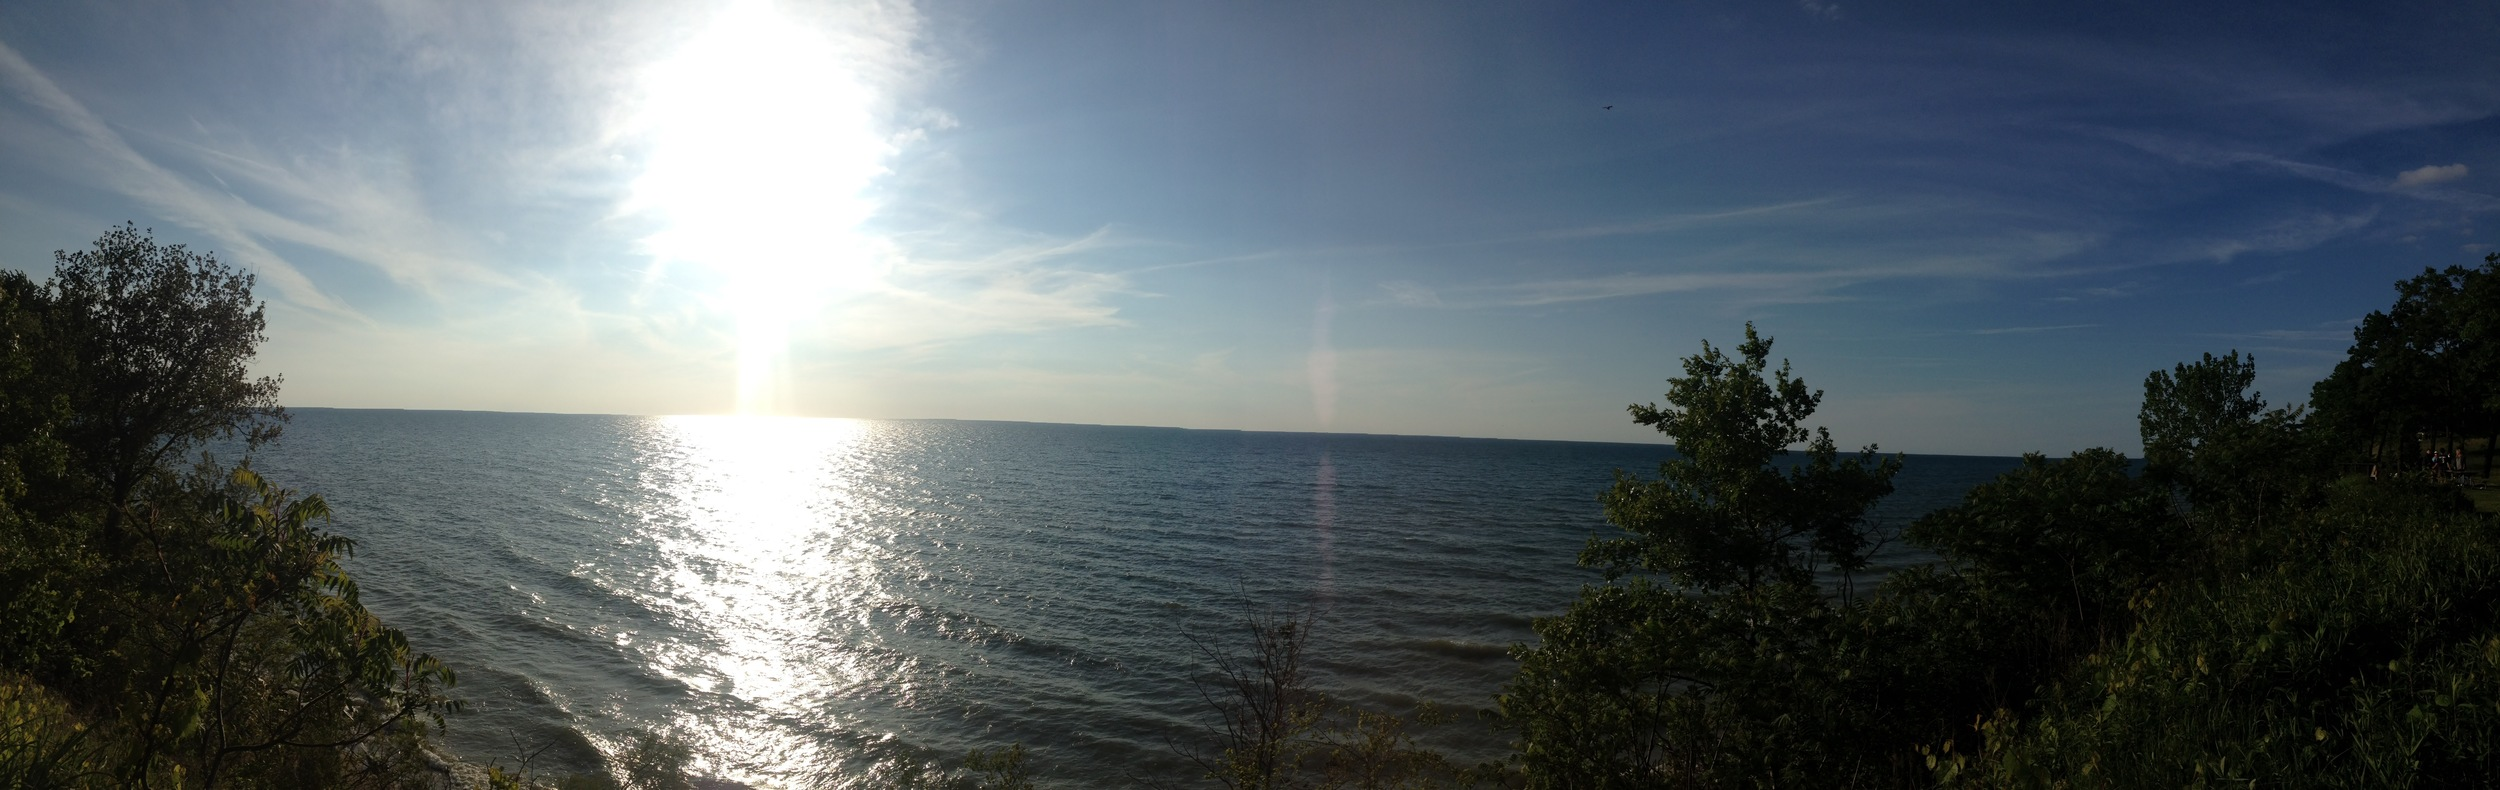 Lake MI.jpg